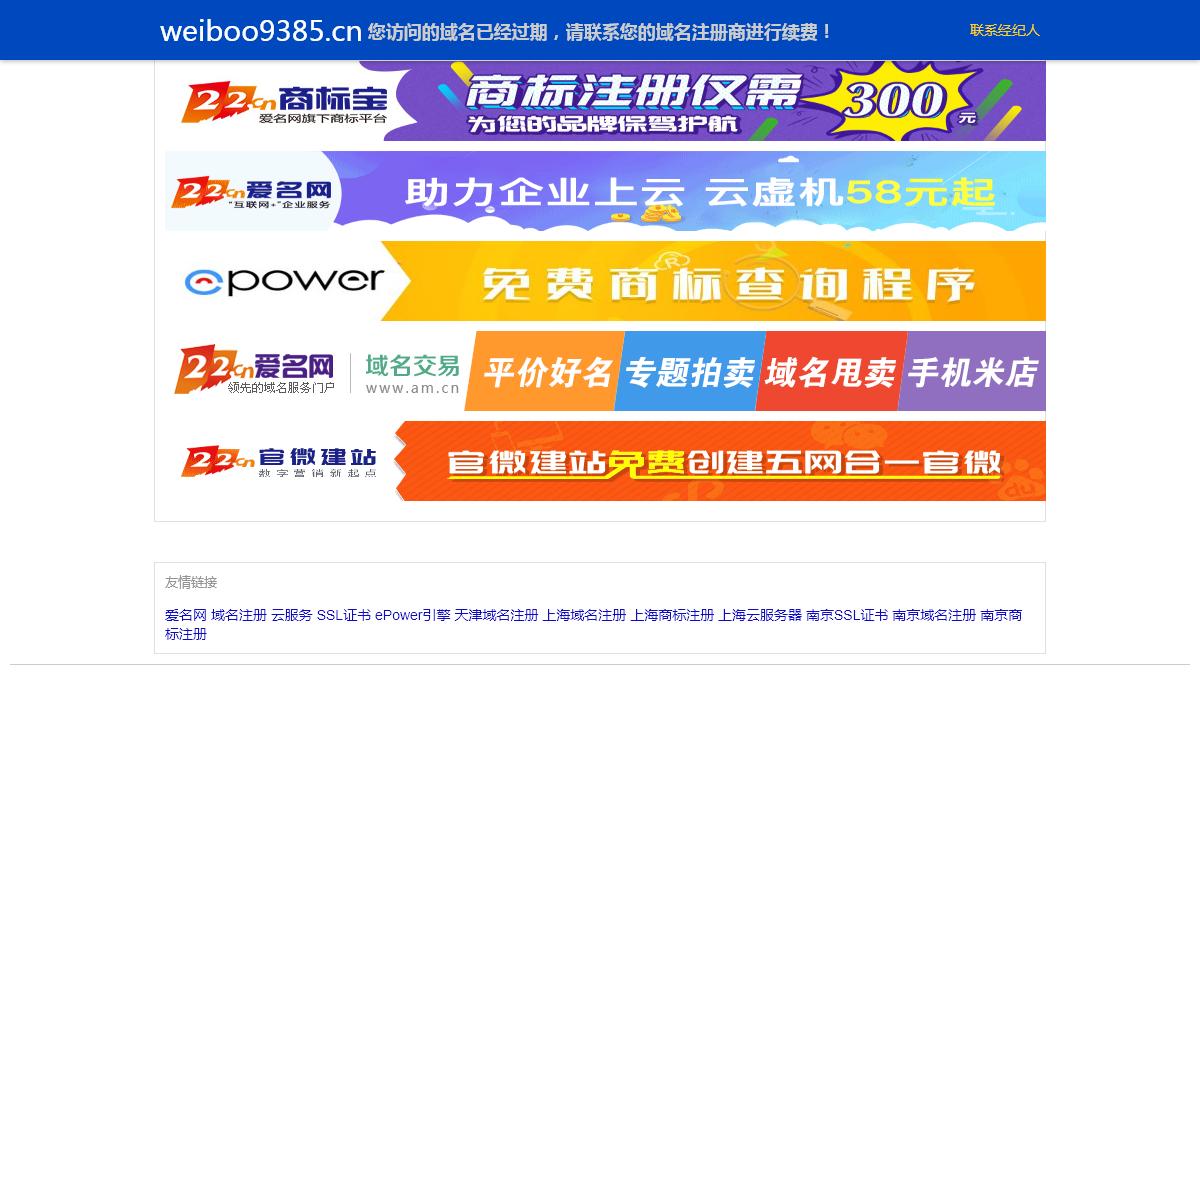 weiboo9385.cn到期,请续费